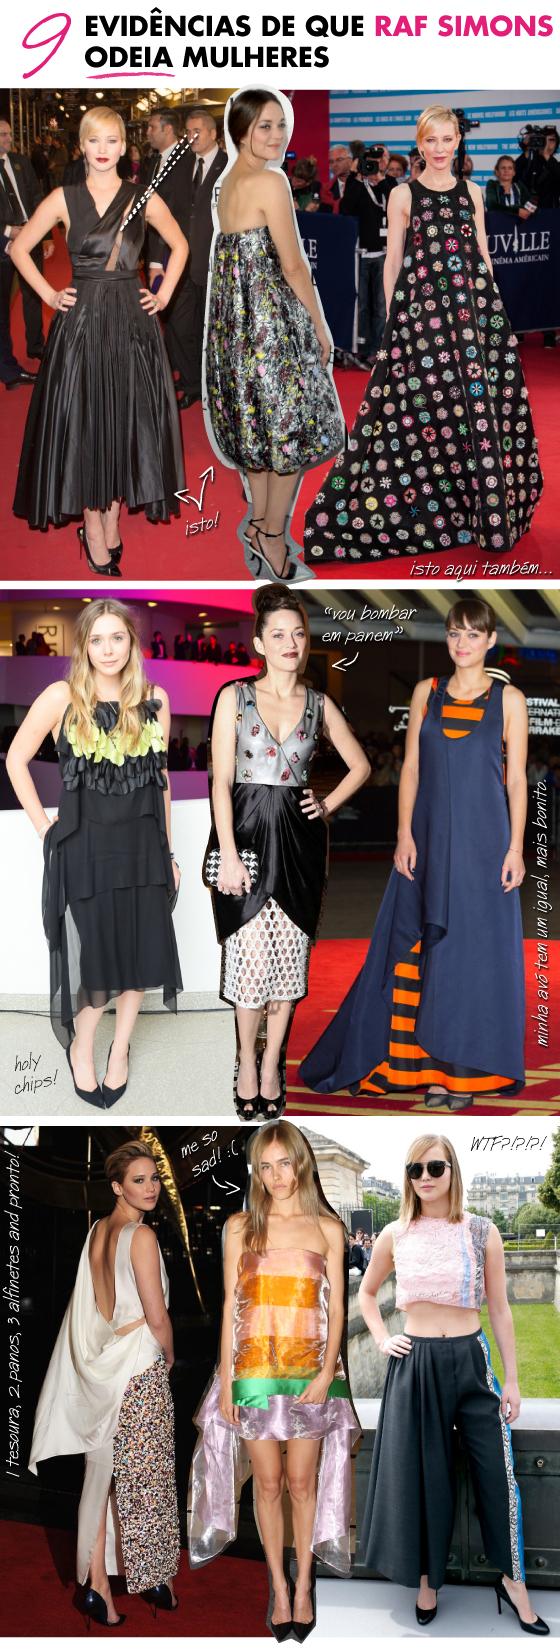 9-evidencias-de-que-raf-simons-dior-odeia-mulheres-jennifer-lawrence-vestido-dior-feio-look-ugly-dress-marion-cotillard-john-galliano